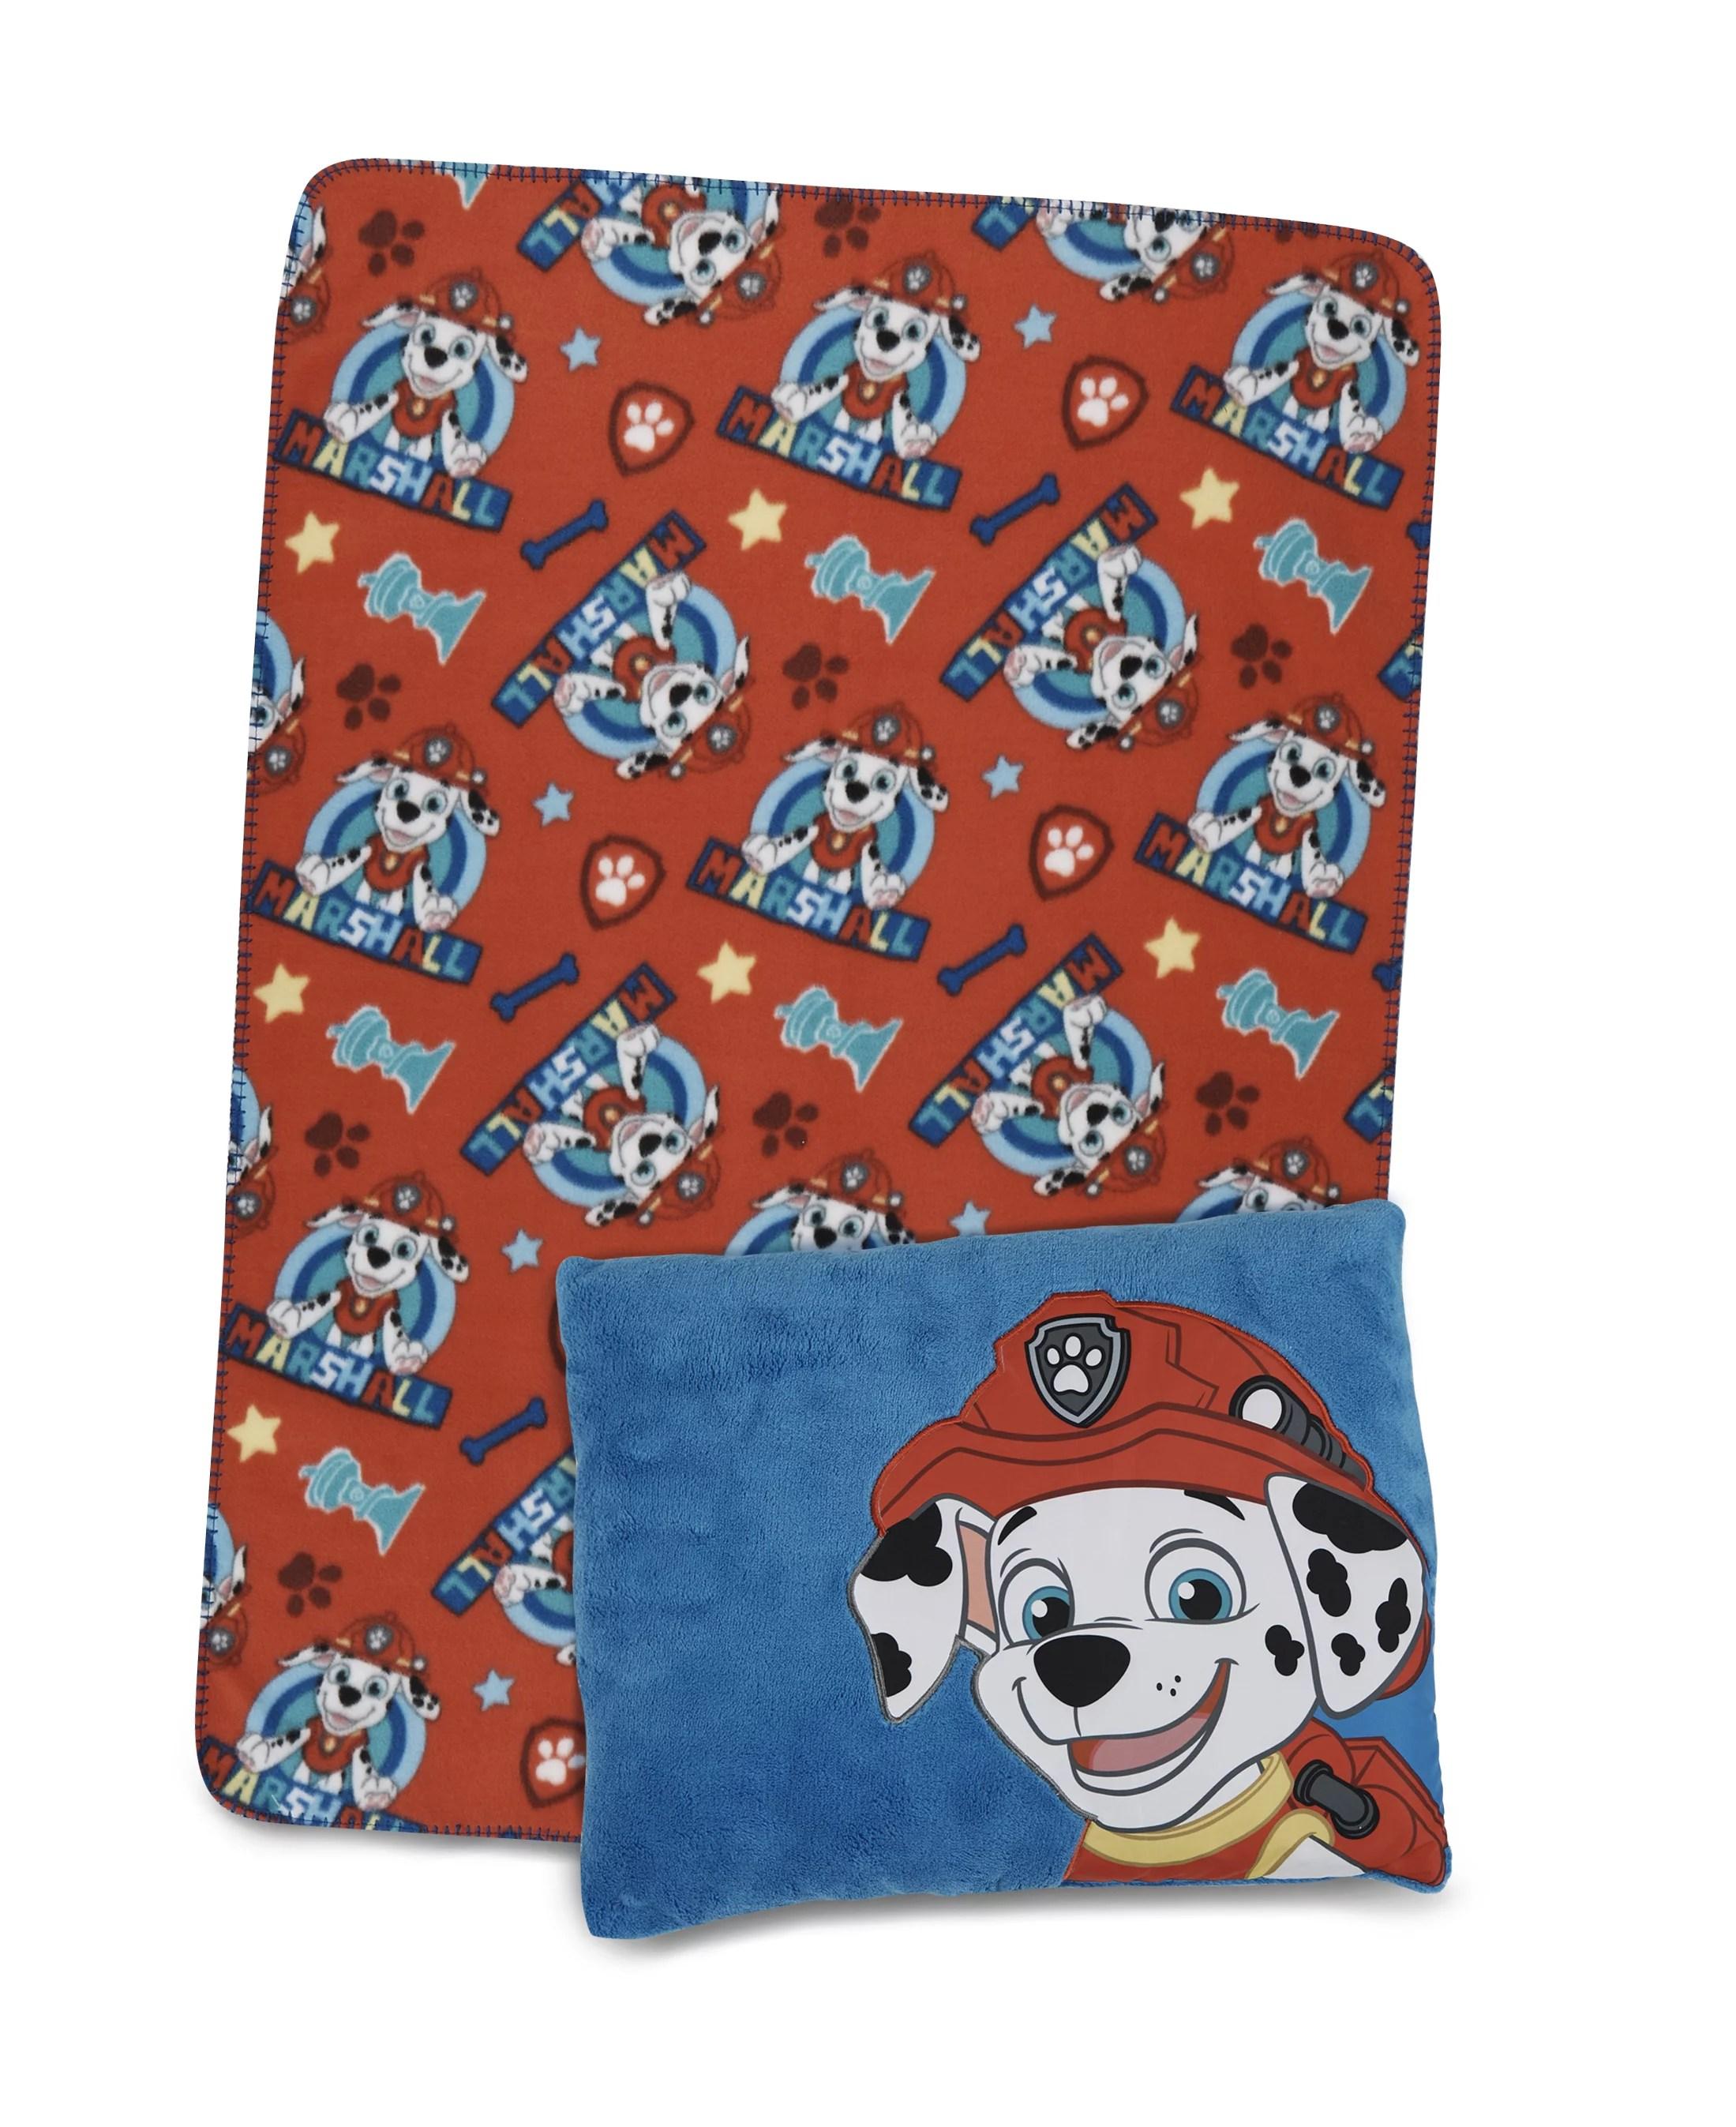 paw patrol marshall toddler pillow blanket set walmart com